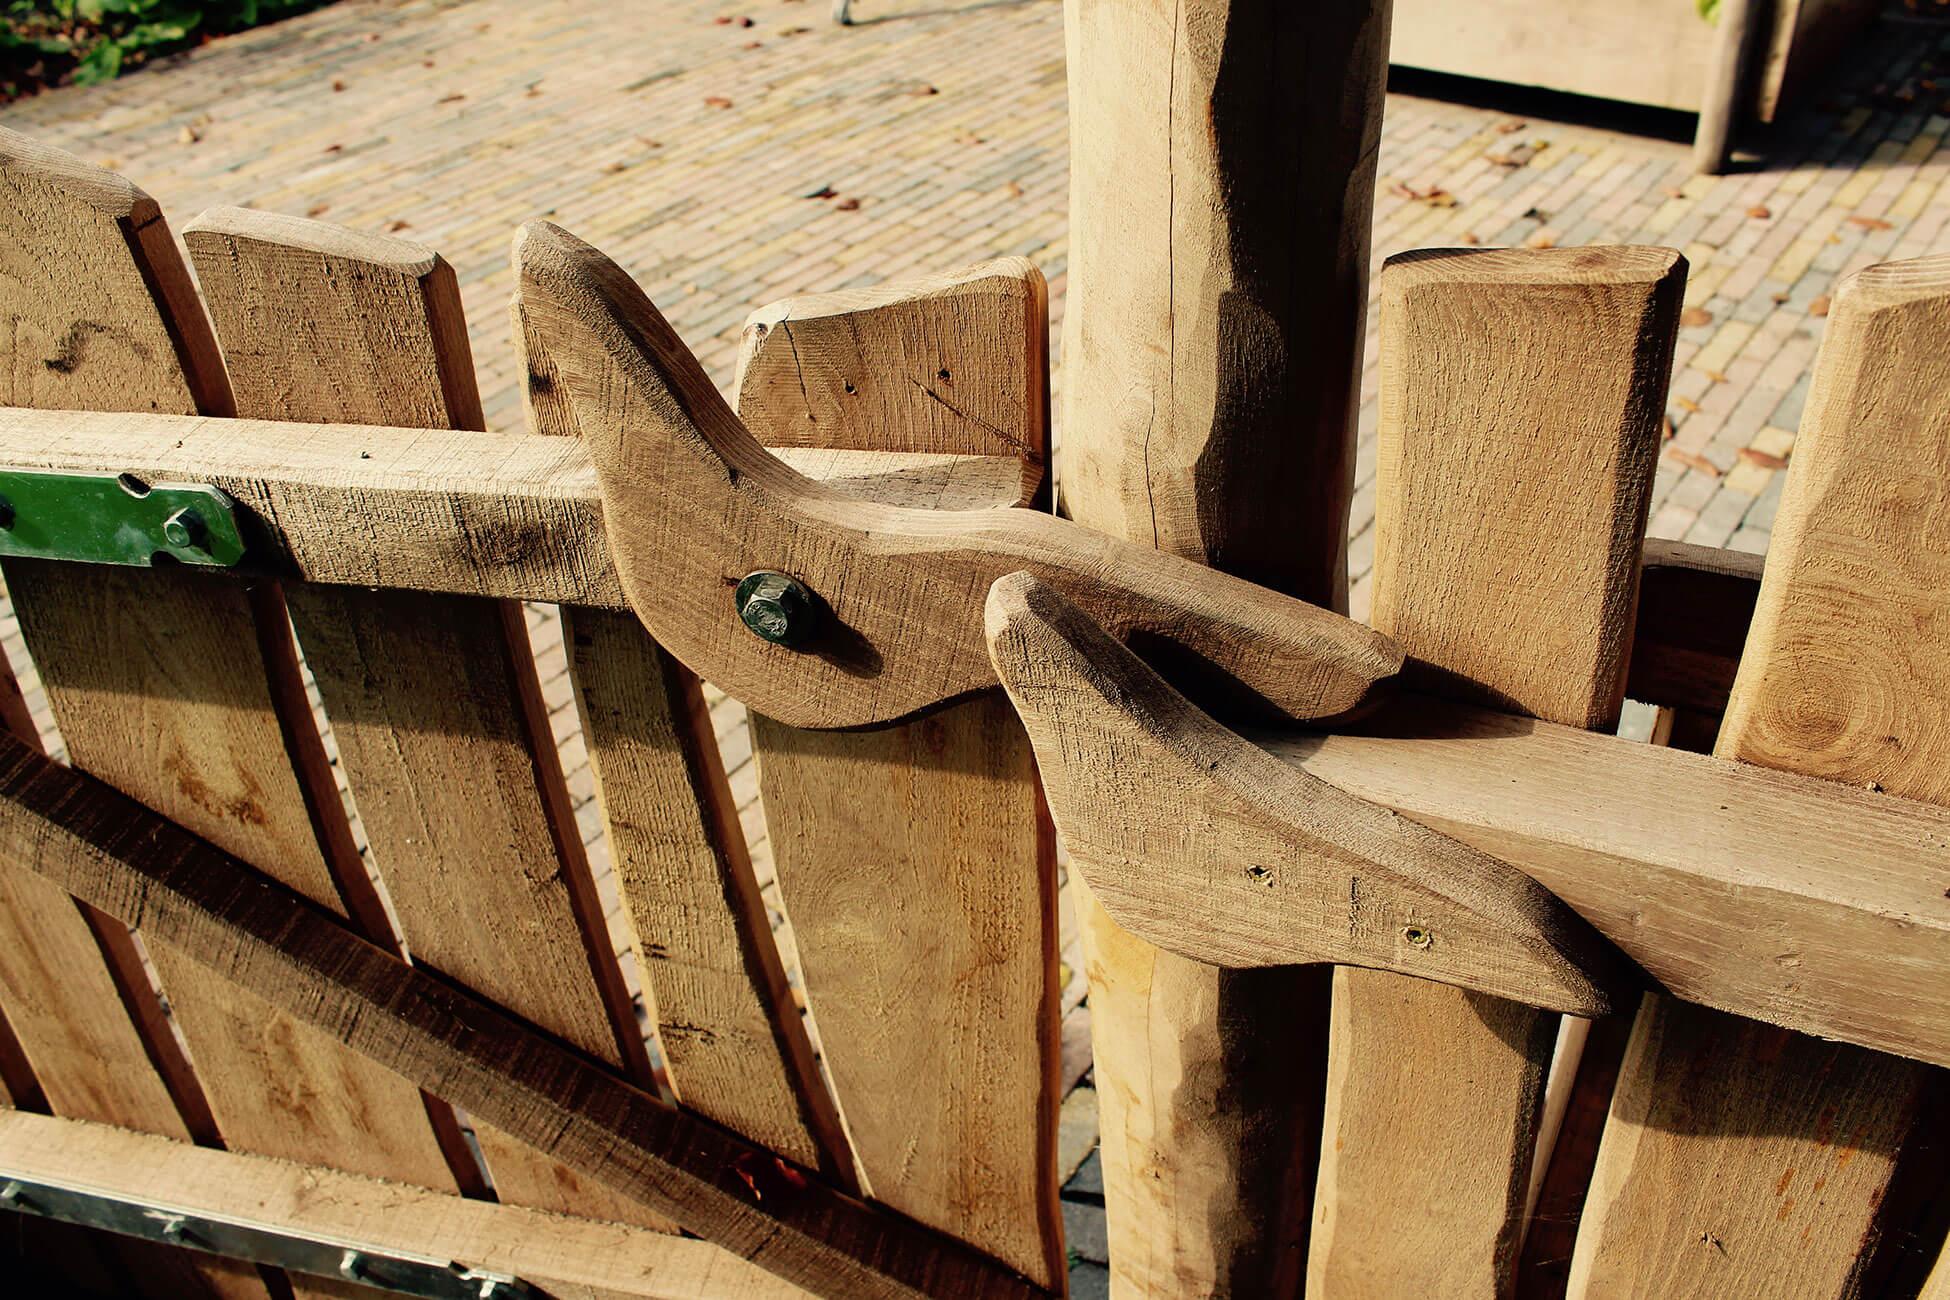 houten hek natuur speeltuin